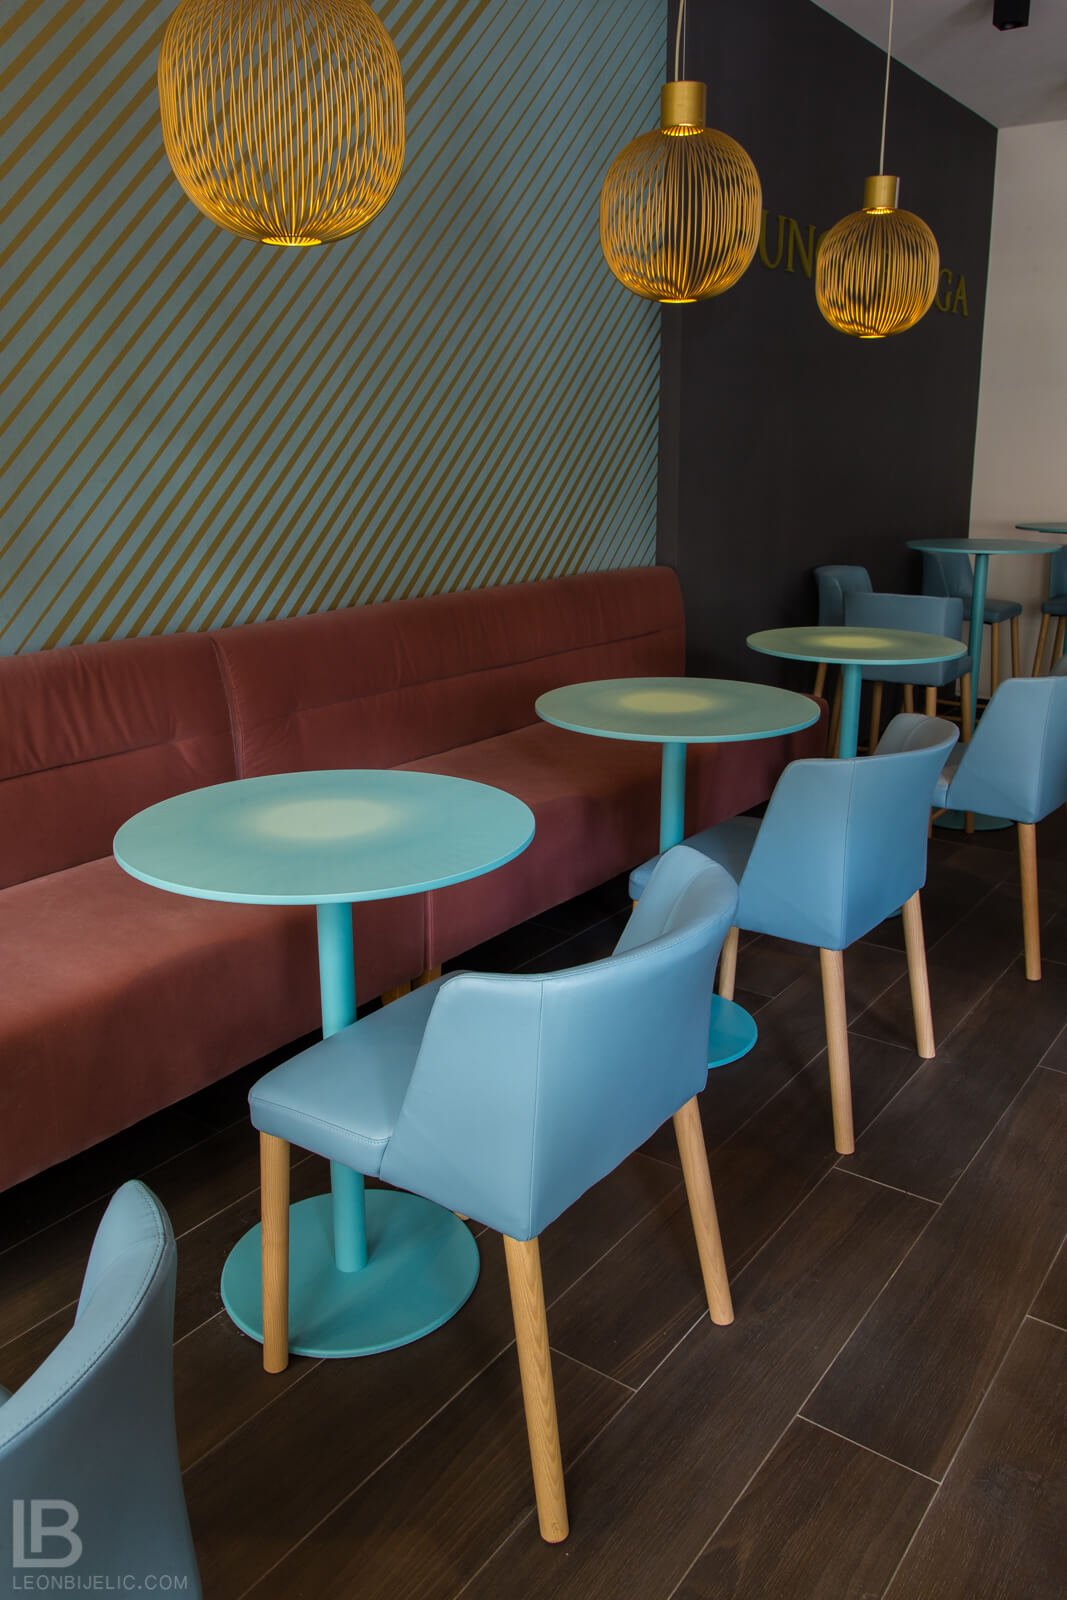 BUNGA BUNGA JAJCE CAFFE NIGHT BAR / INFUTURO INTERIOR